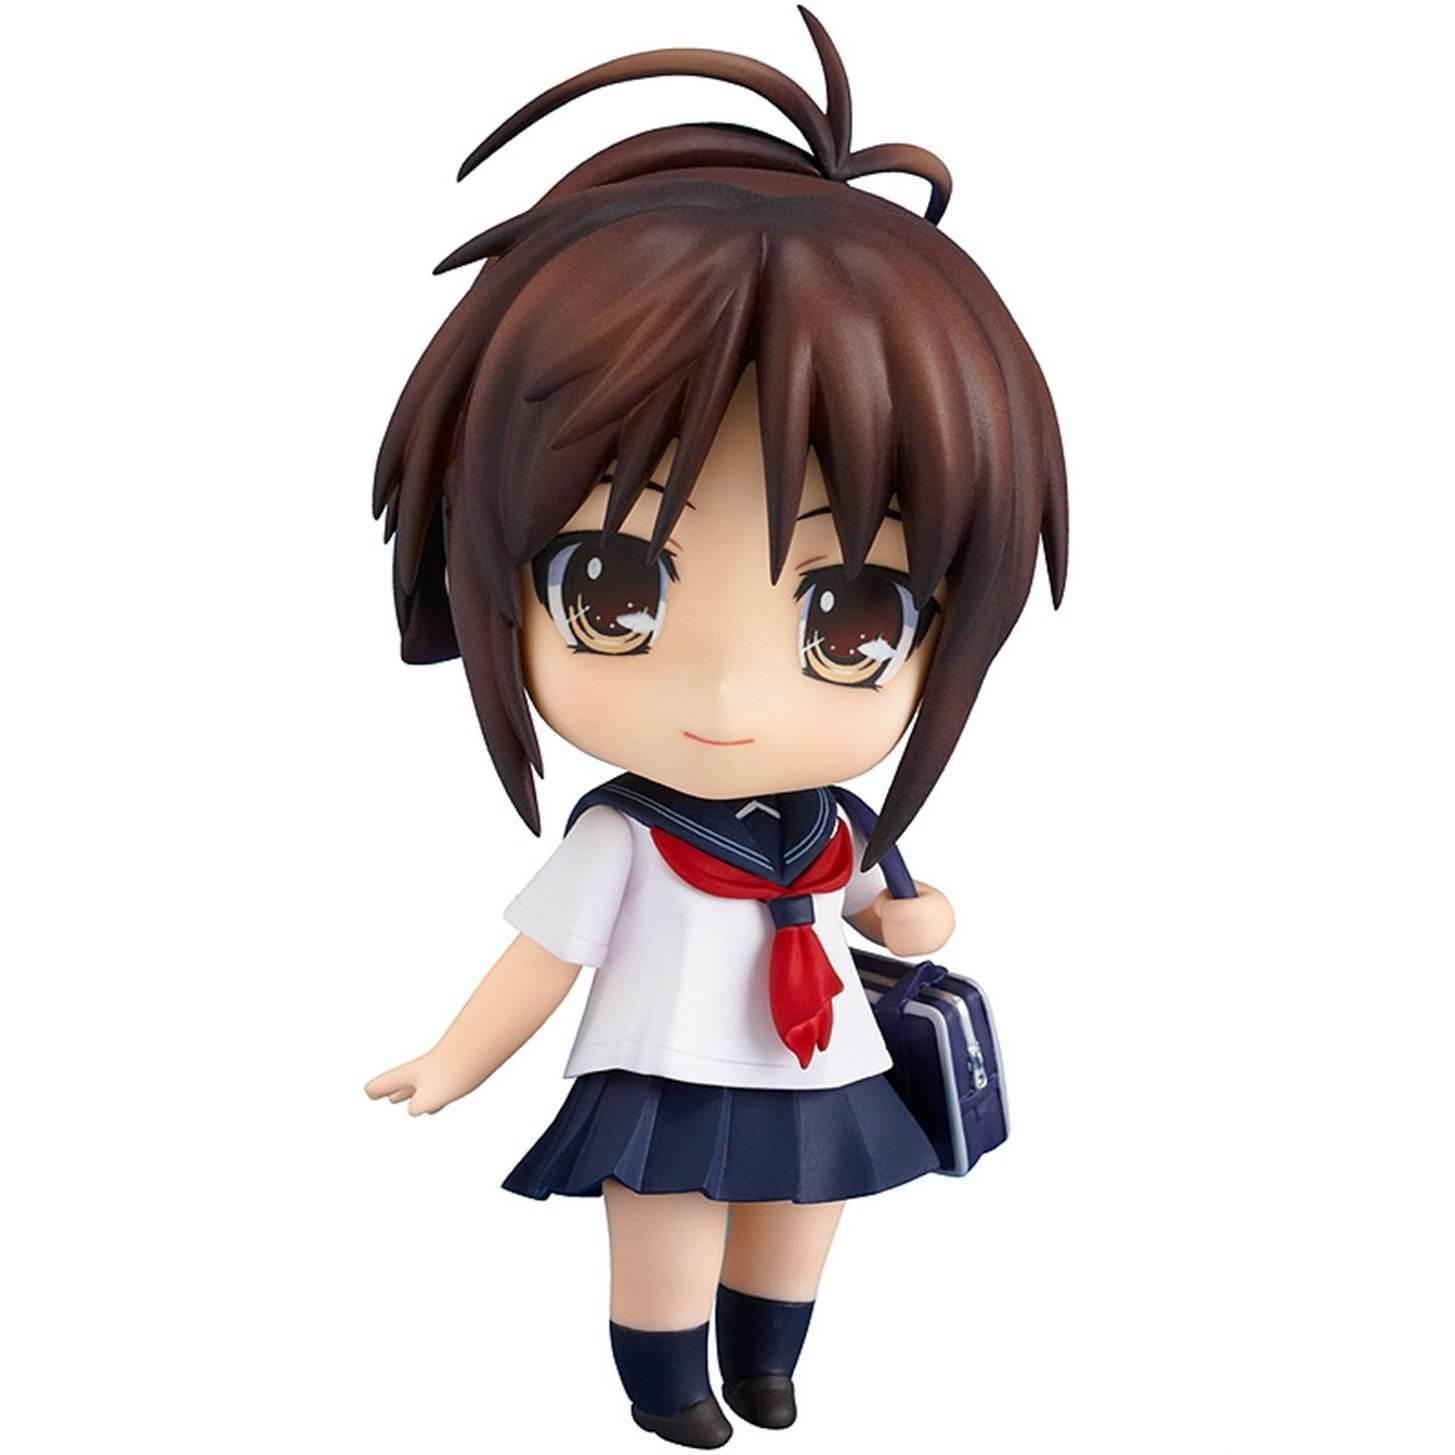 Minami Kawashima Nendorid Action Figure